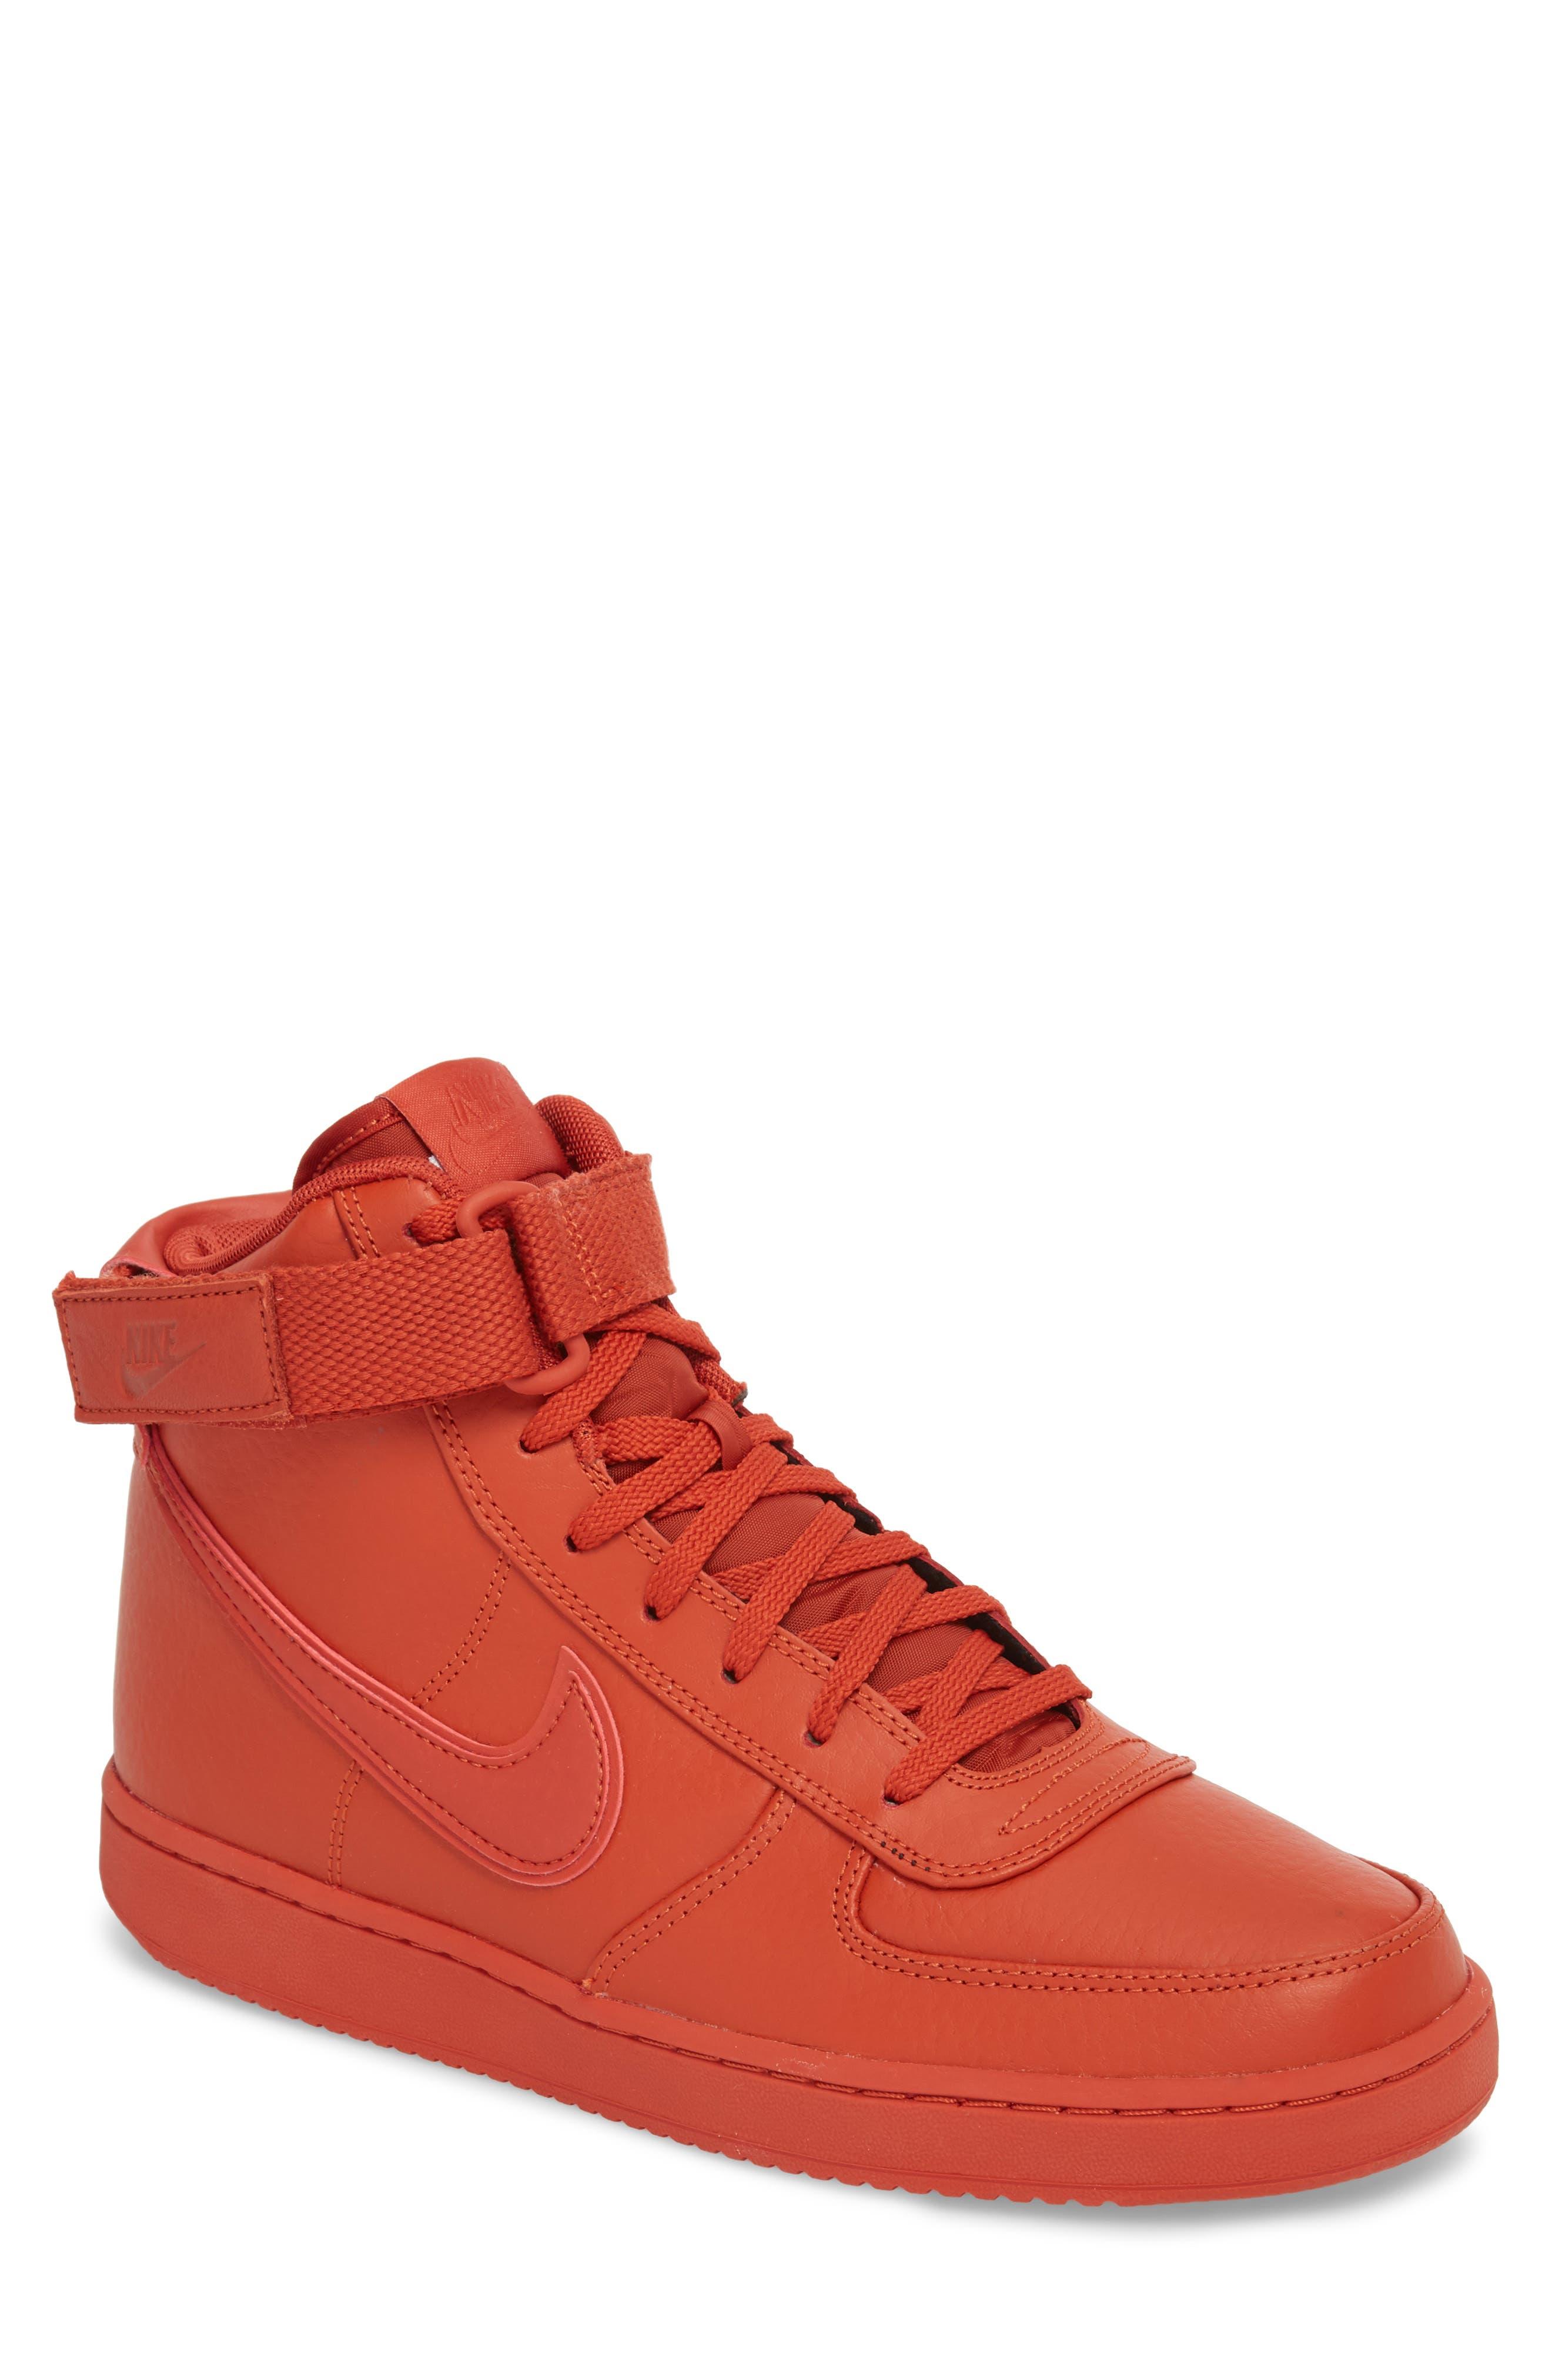 Nike Vandal High Supreme Leather Sneaker (Men)